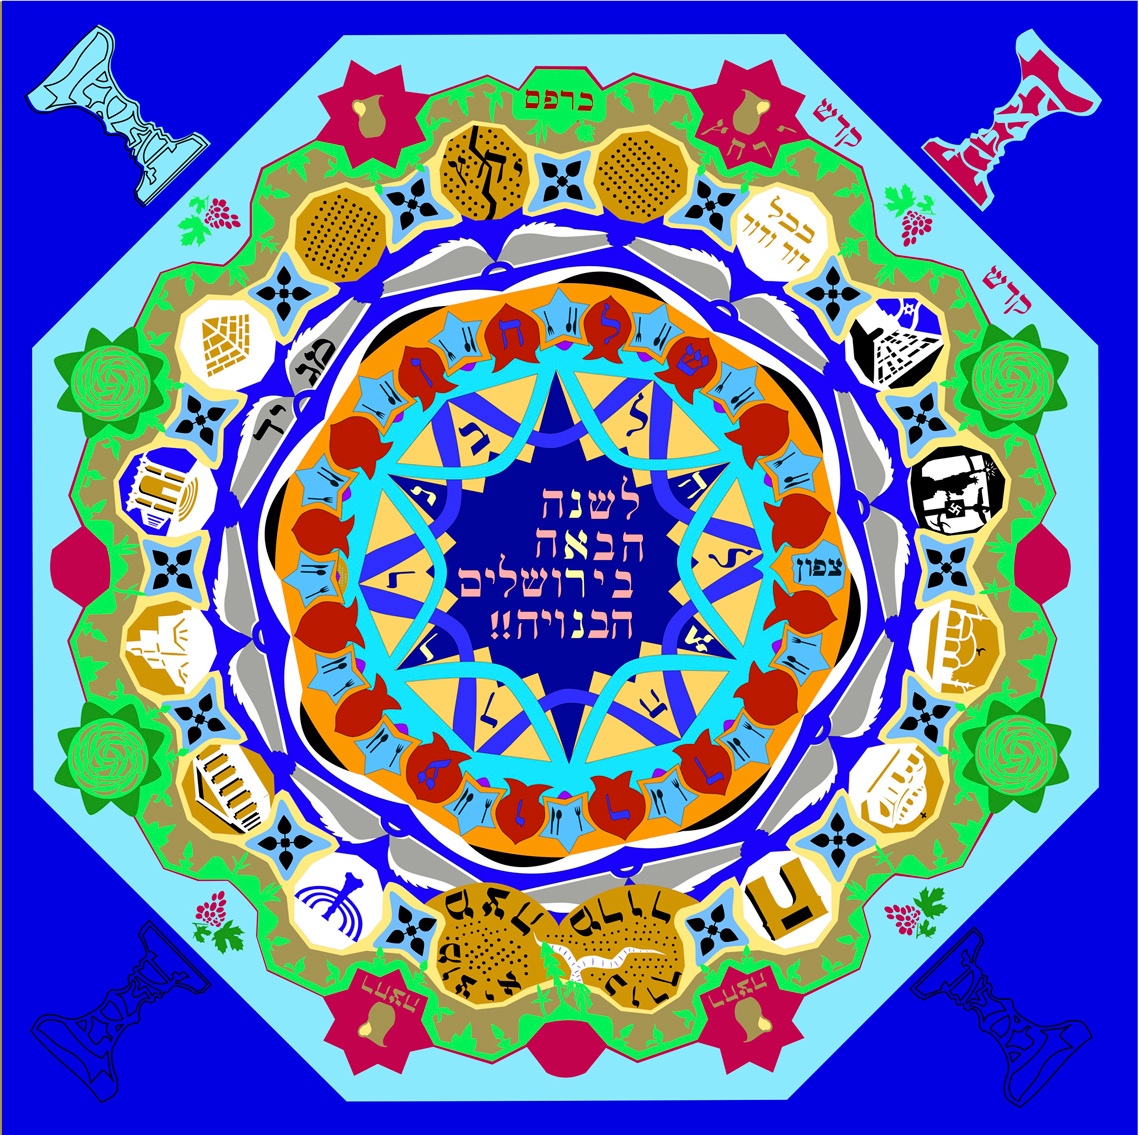 Seder-Plate-Octagon-Combined-Lettering-Barech-Hallel-Nirtzah-jpeg2.jpg